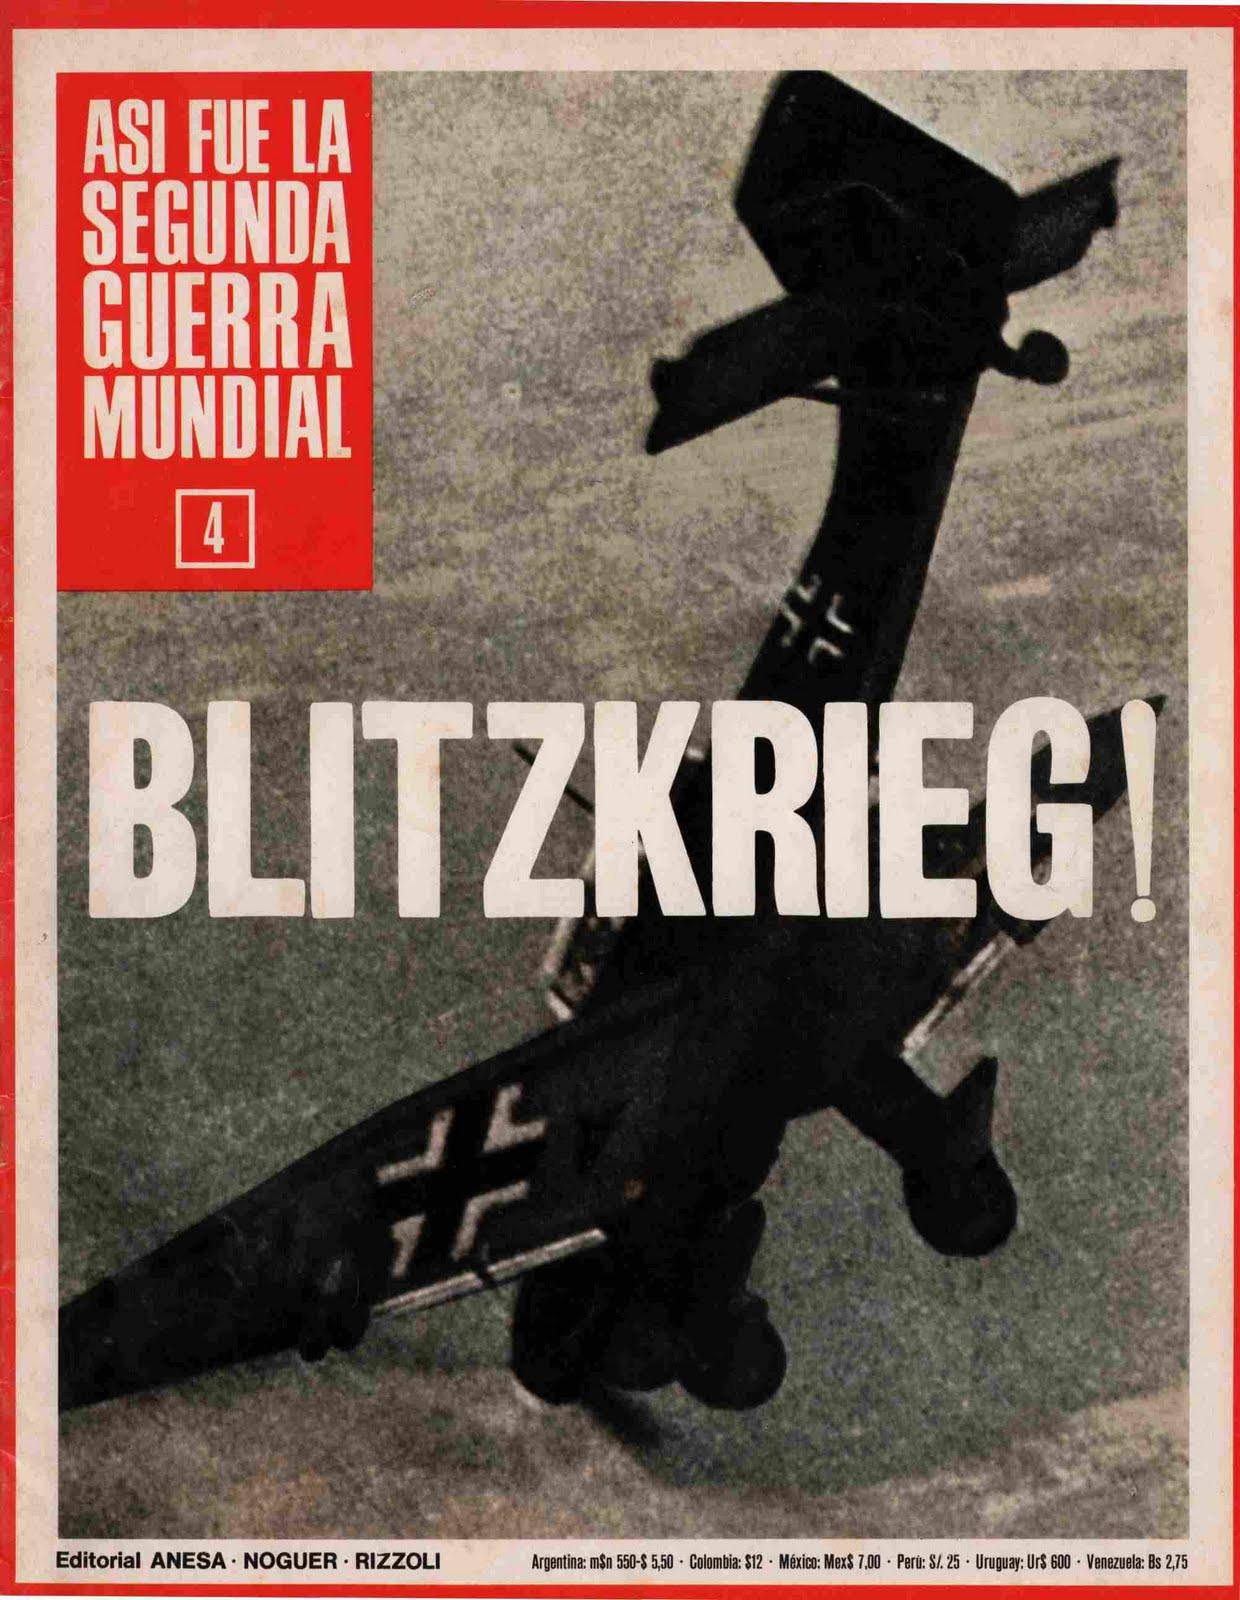 la segunda guerra mundial descarga: